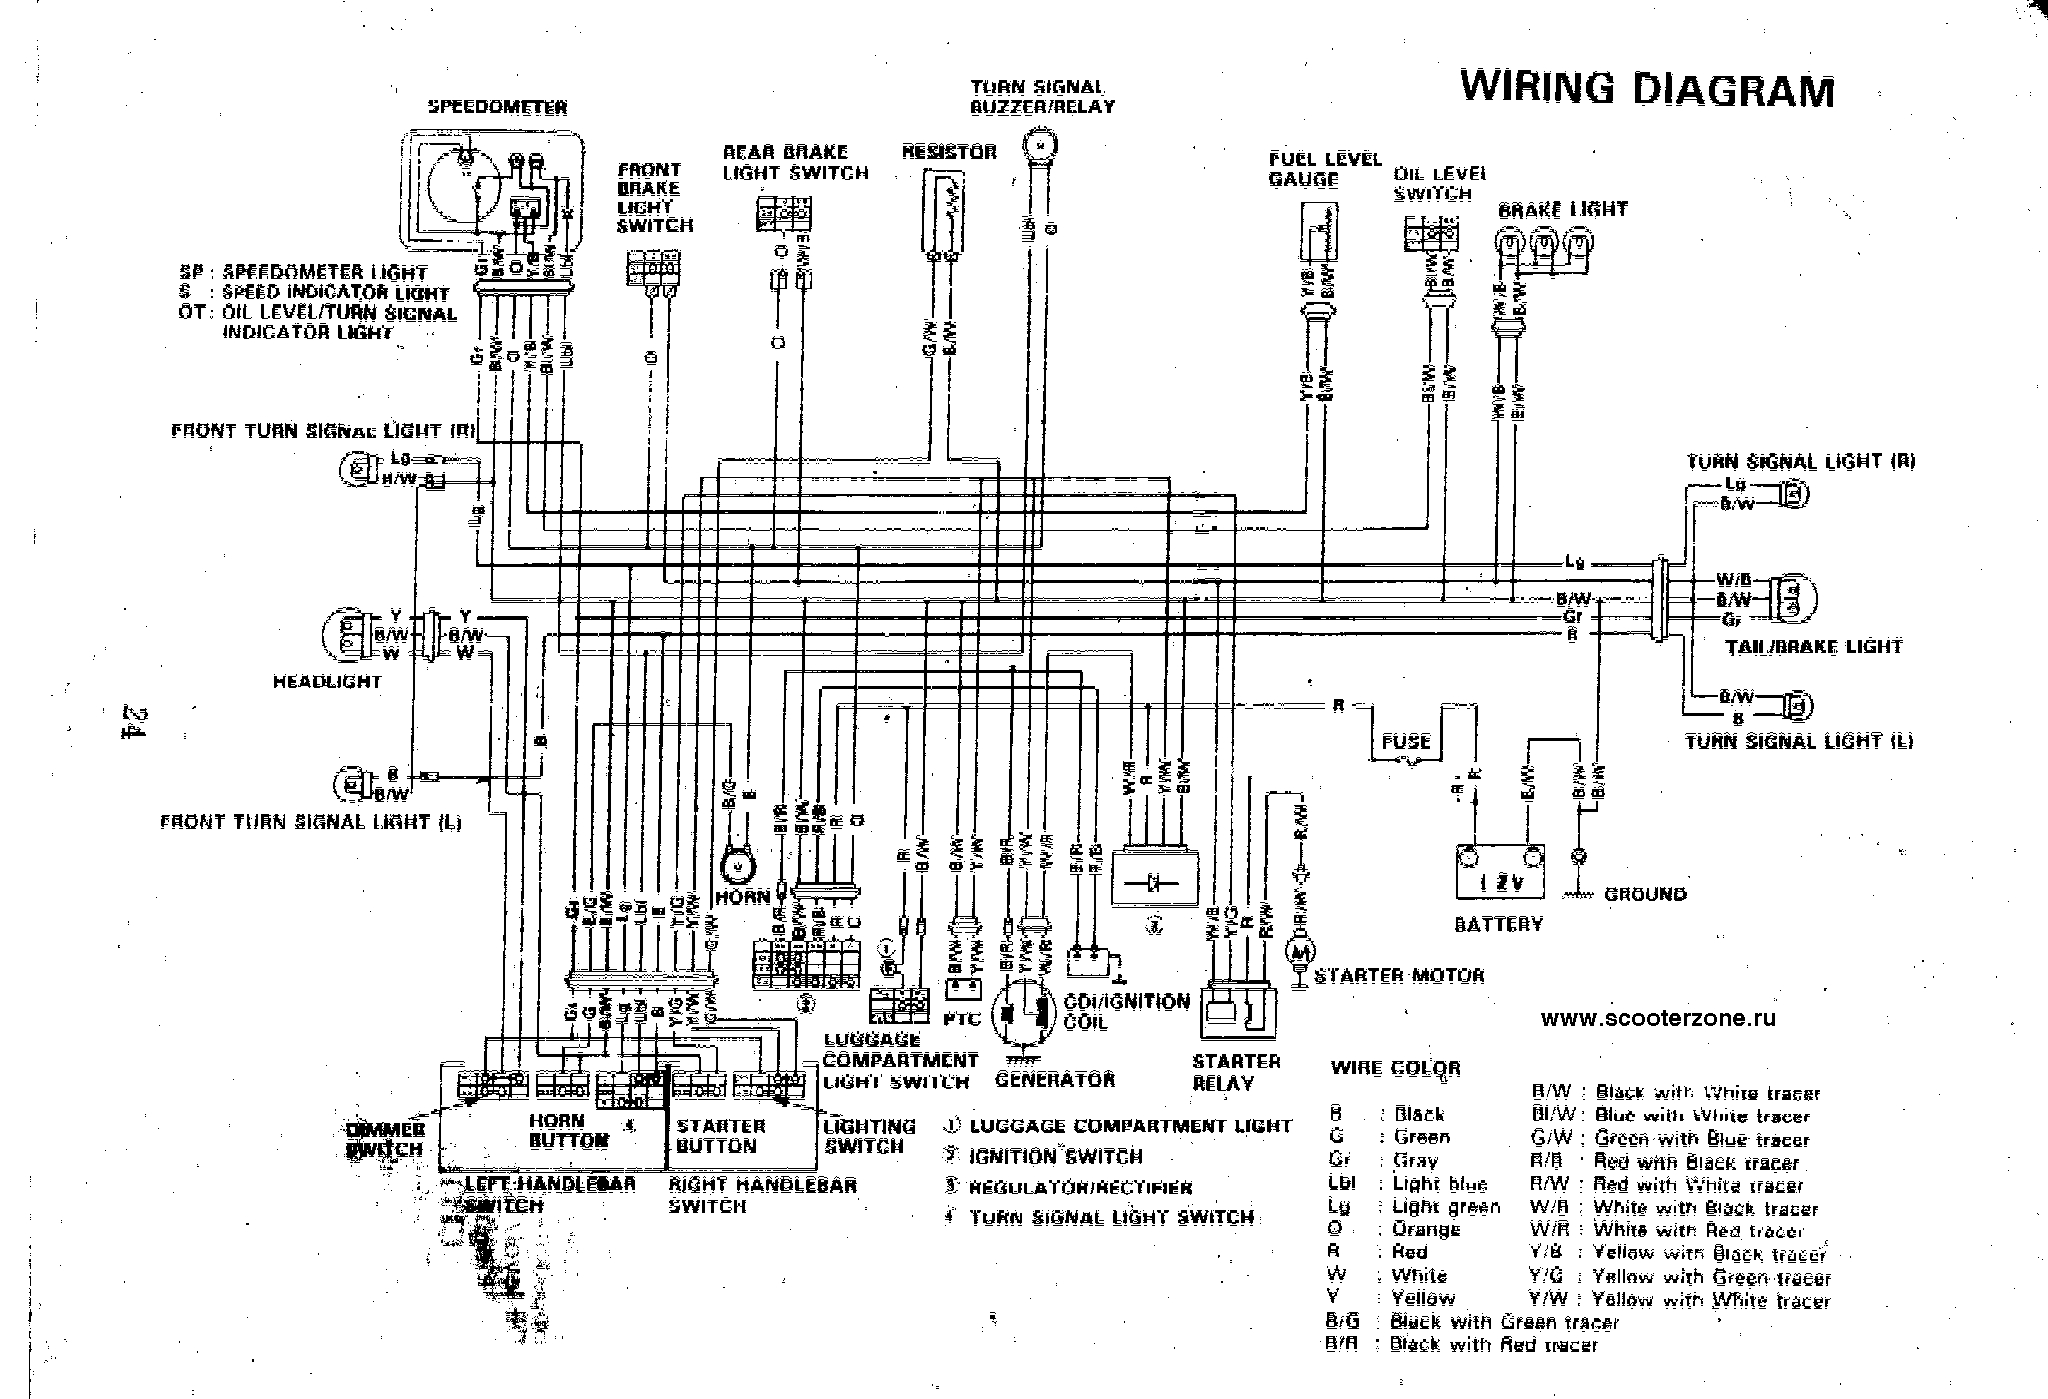 Suzuki Gt750 Wiring Diagram Librarydownload Moto Schem Address Motorcycle Manuals Pdf Diagrams